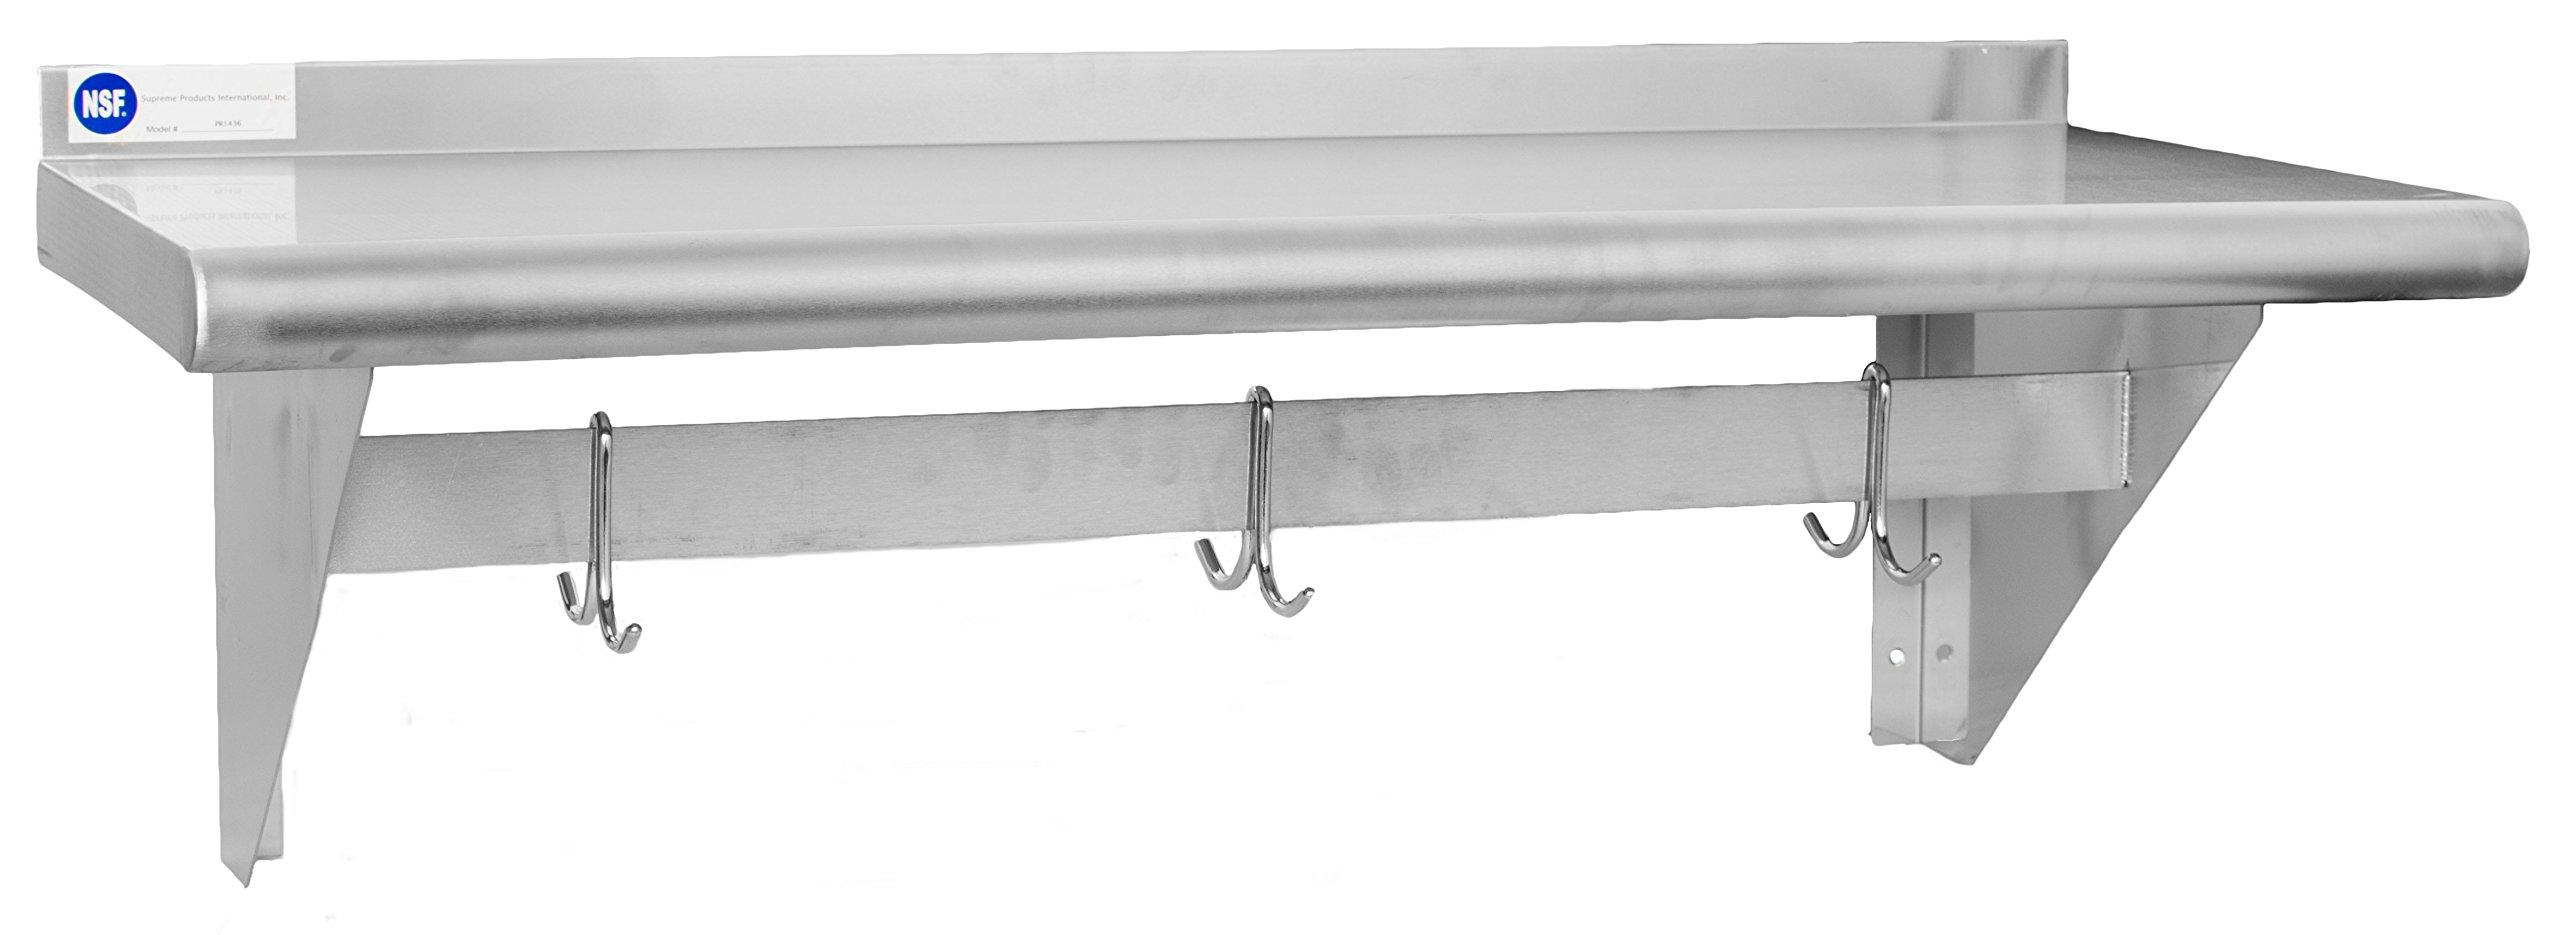 Gusto - 14'' x 36'' Stainless Pot Rack Shelf w/ 3 Hooks